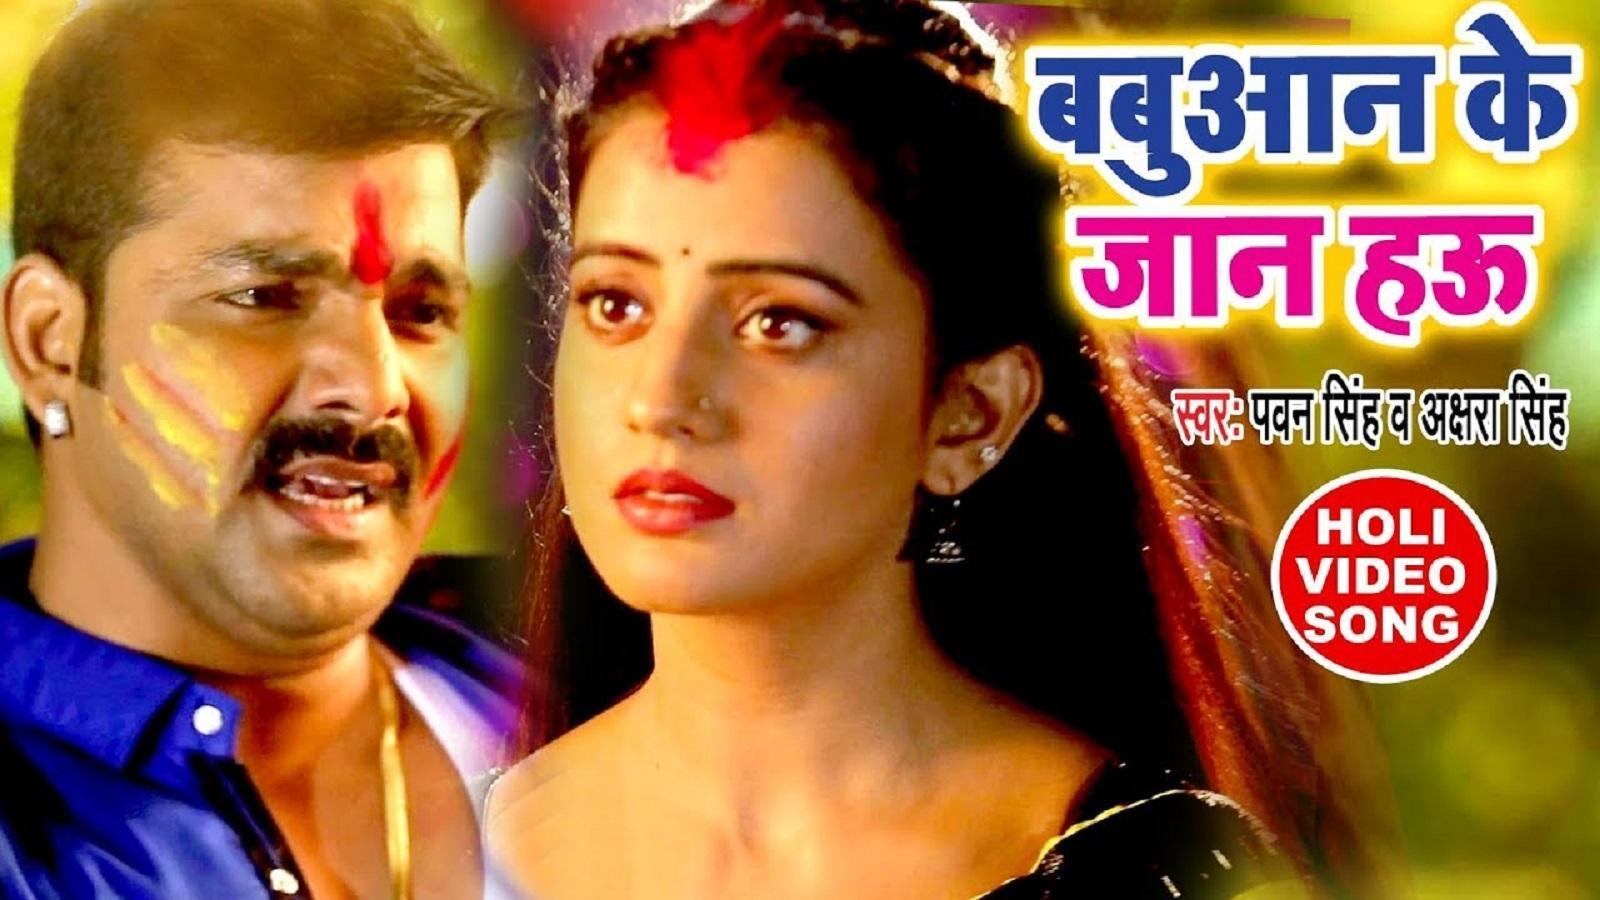 New Bhojpuri Song Holi Geet Video 2020: Latest Bhojpuri Gana 'Babuaan Ke  Jaan Hau' Ft. Pawan Singh and Akshara Singh